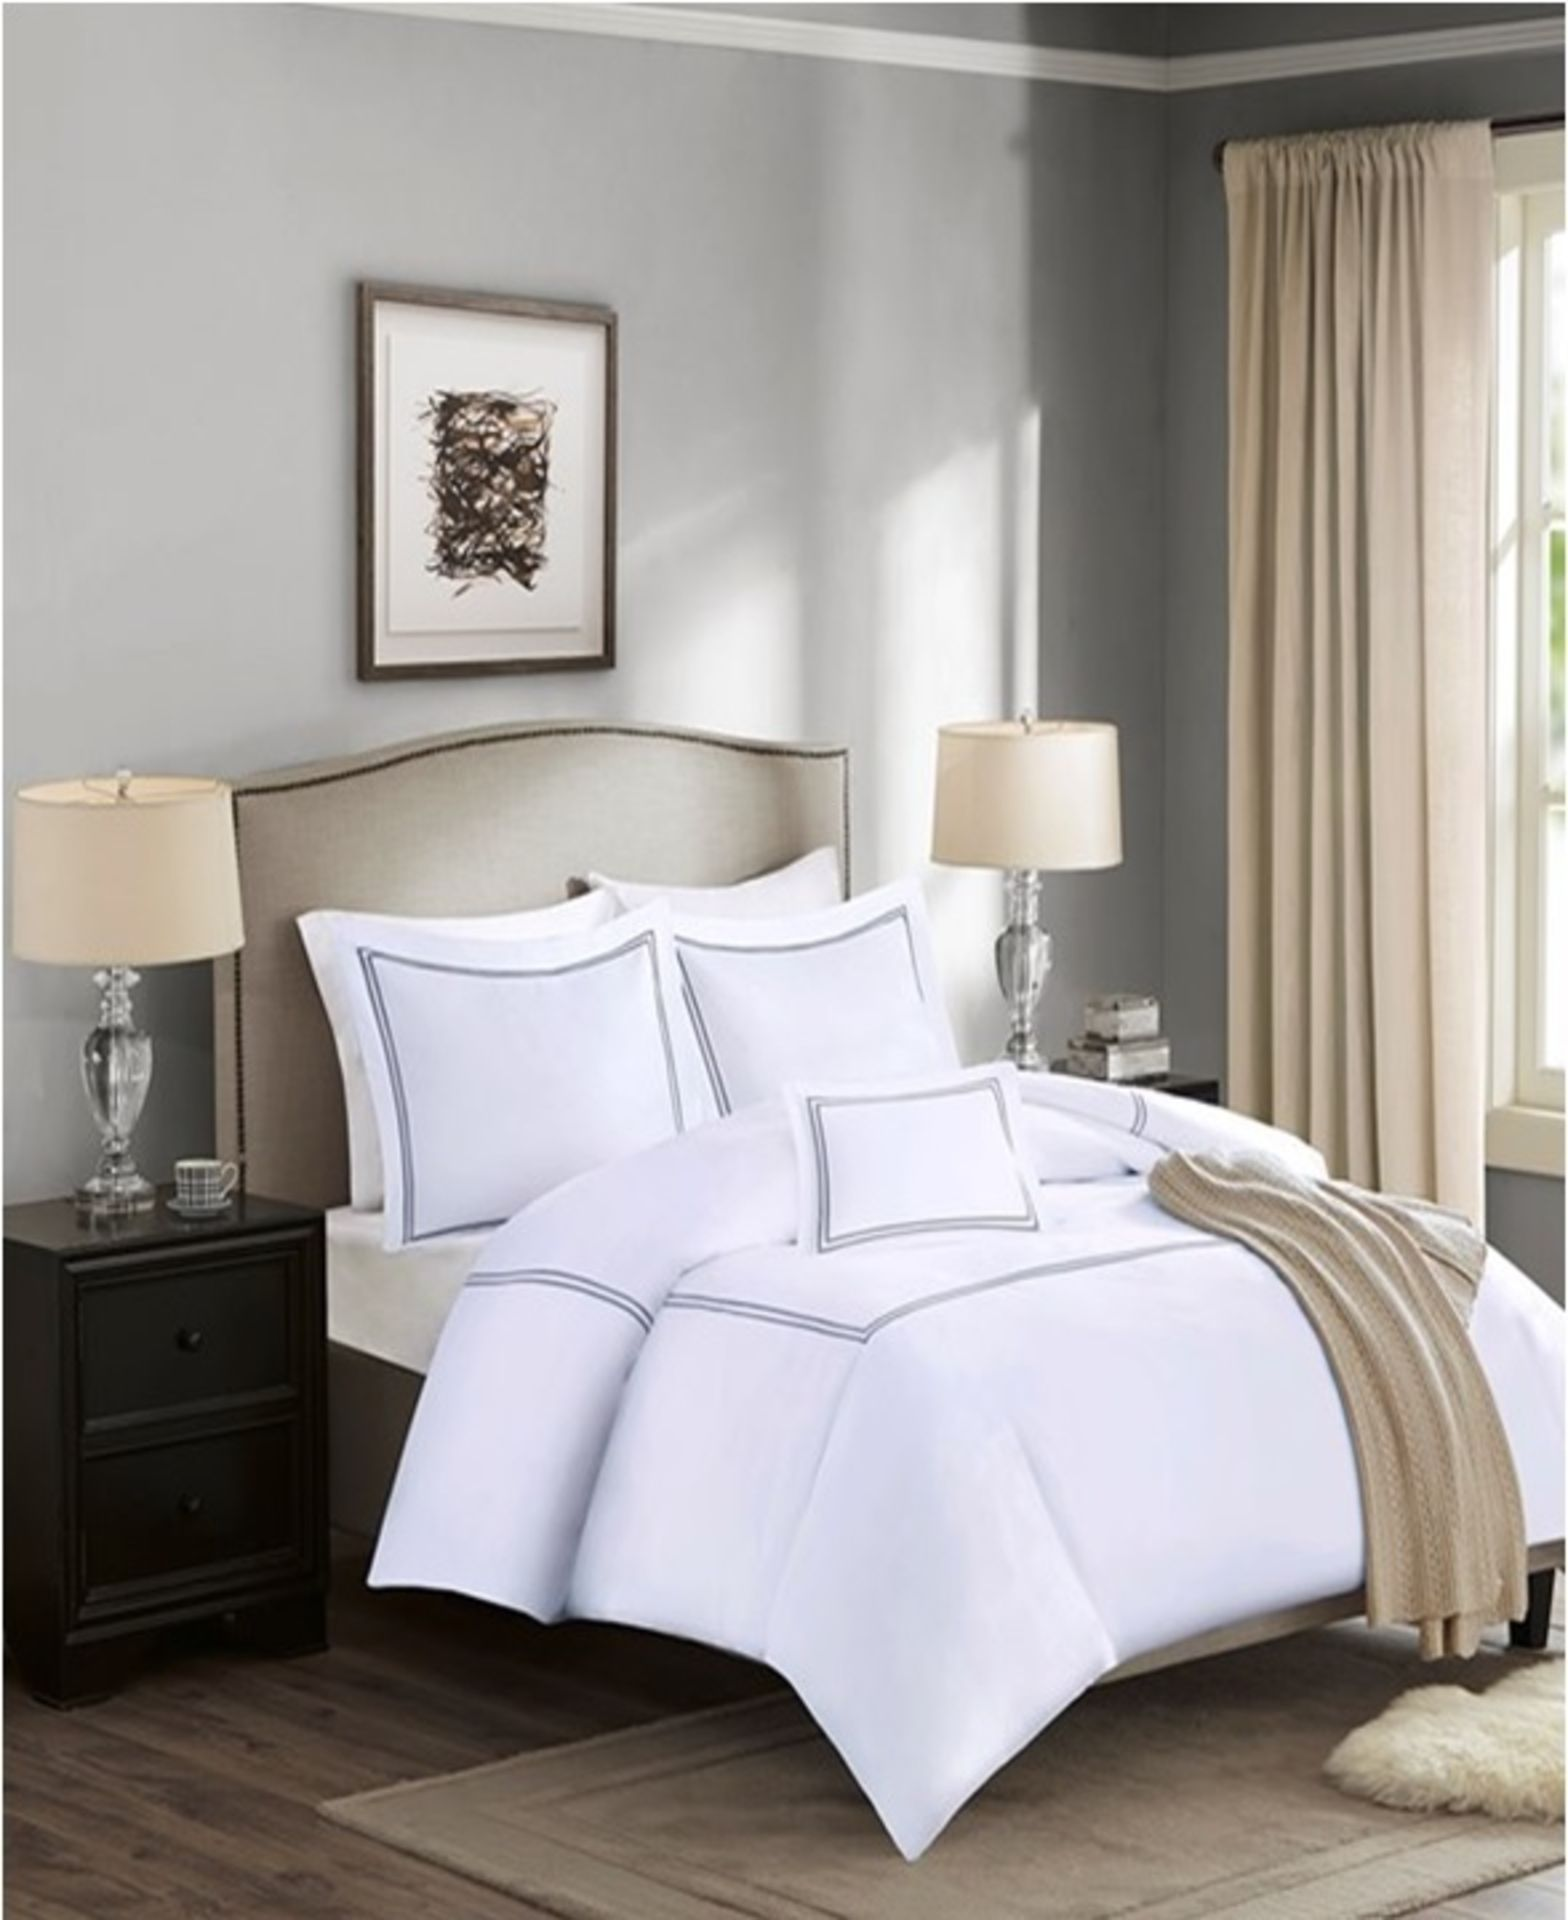 Lot 149 - 1 x Madison Park Luxury Collection Double Duvet Set White - Product Code MP12-0198UK (Brand New -